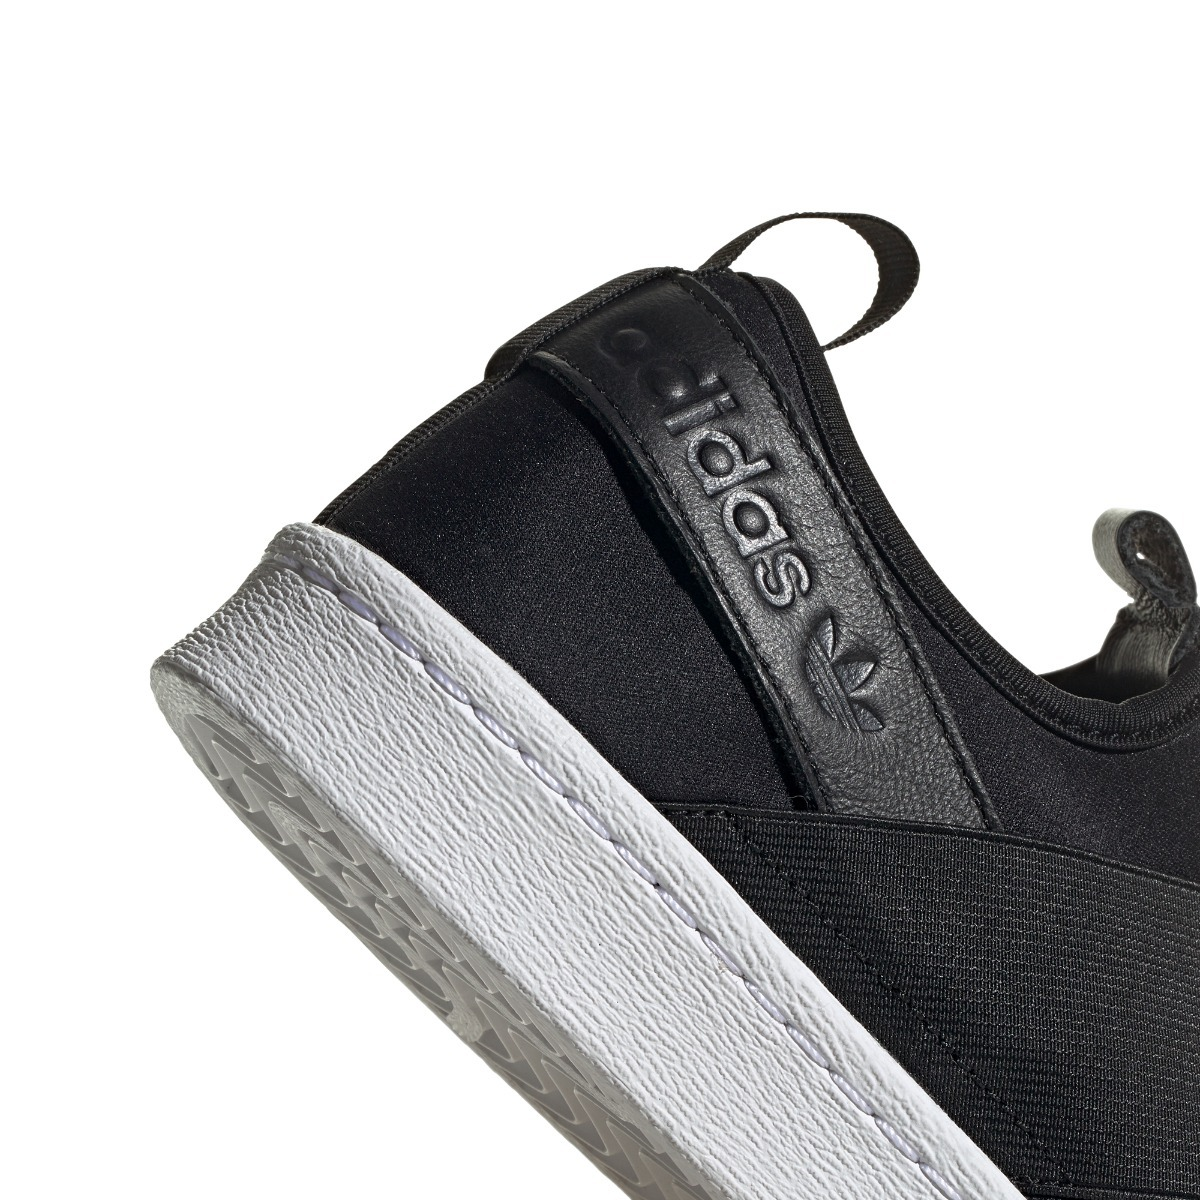 detailed look 831c2 9b63b Championes Dama adidas Superstar Slip-on S81337 - Zooko